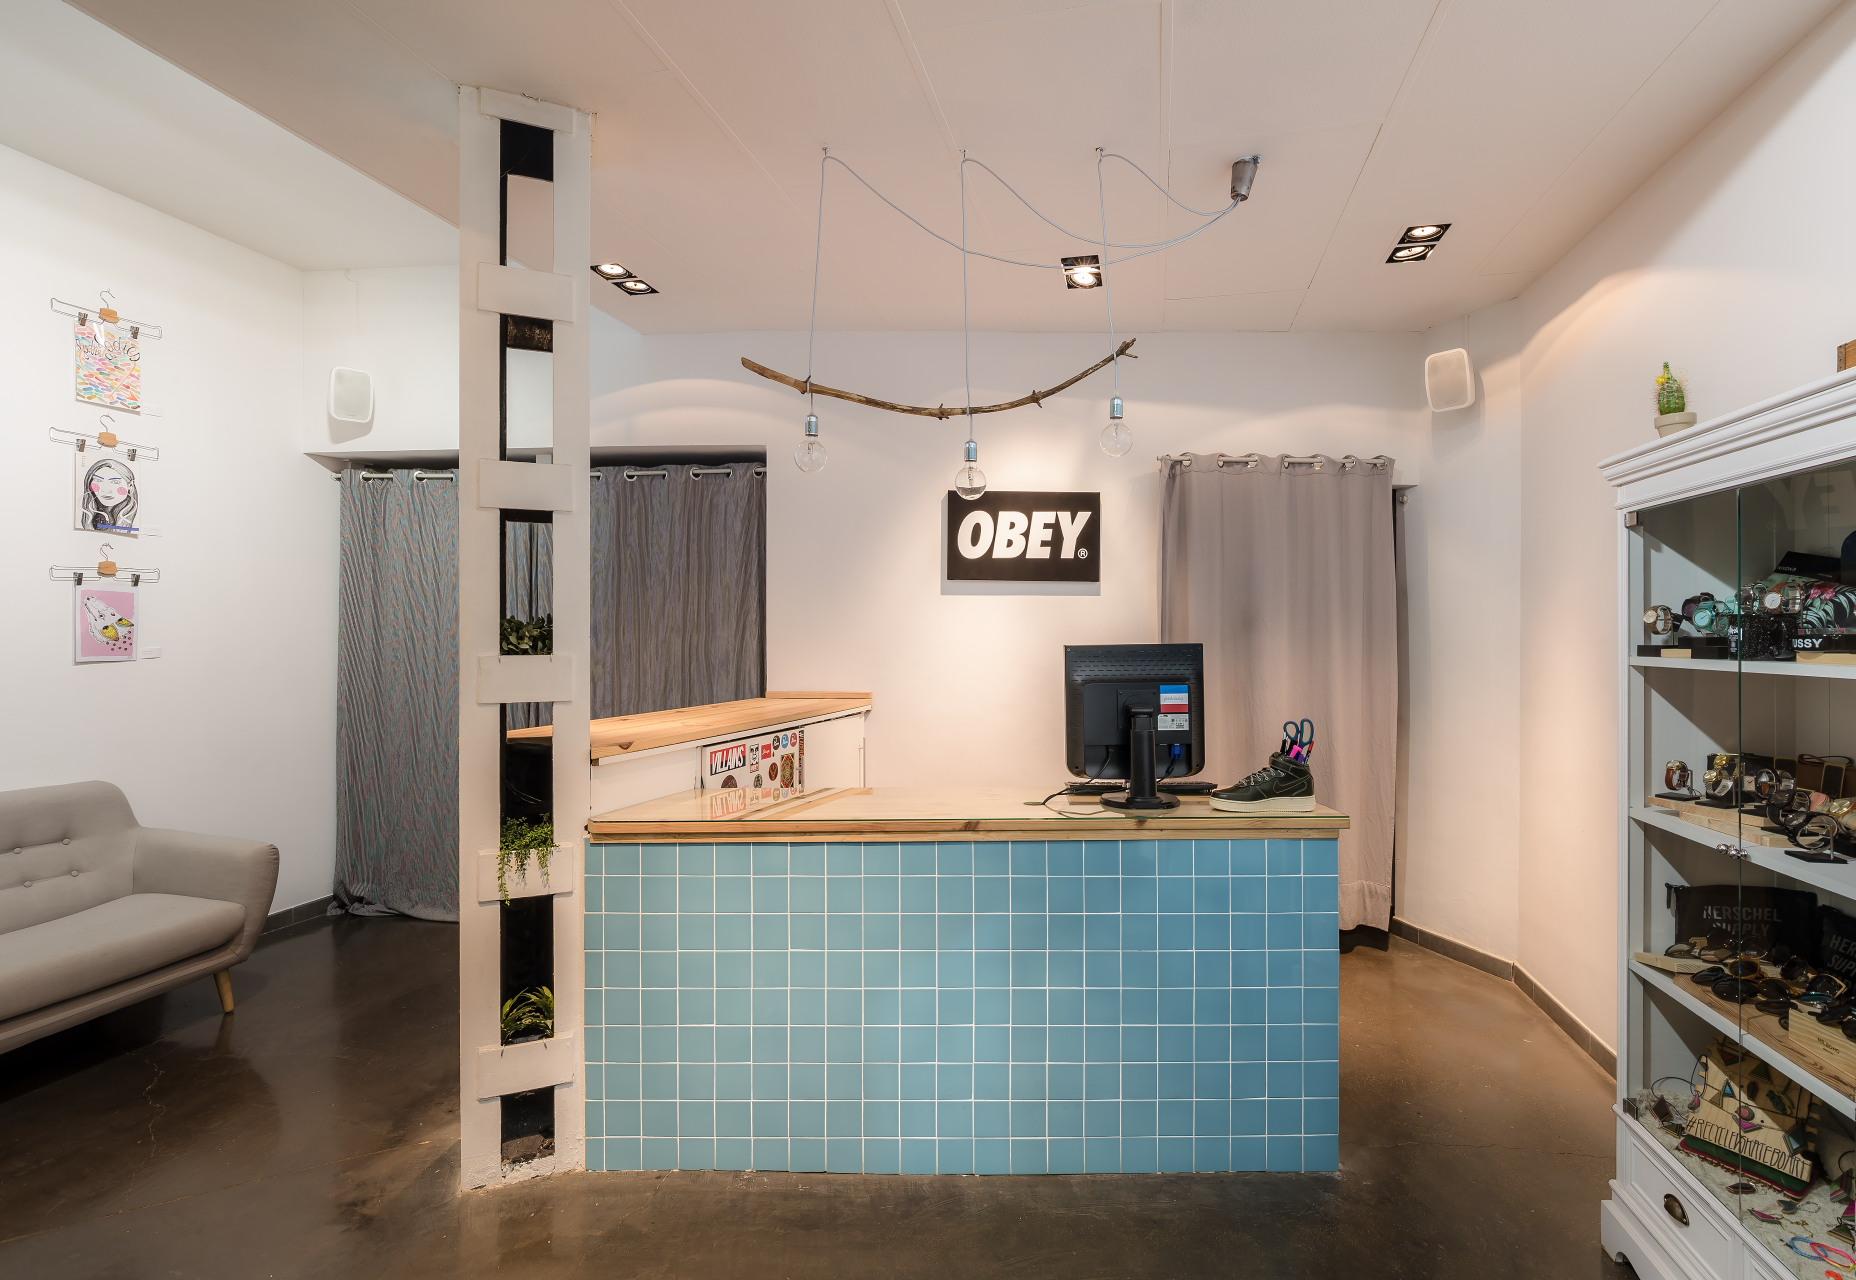 fotografia-arquitectura-interiorismo-valencia-german-cabo-boubau-strap-fortheladies (11)